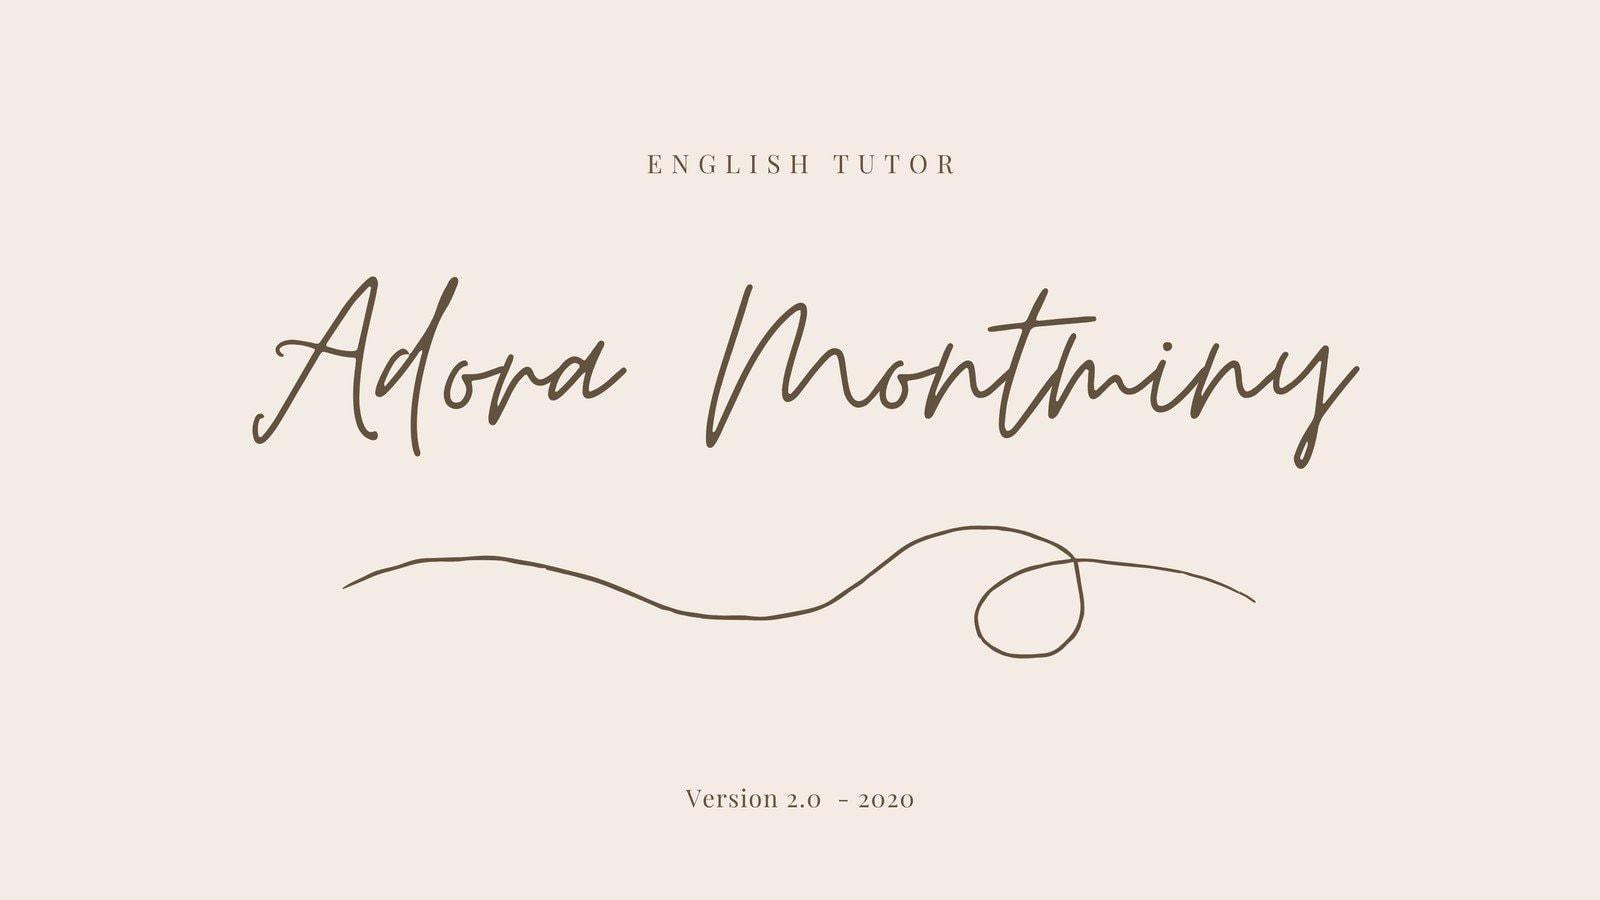 Cream Handwritten English Tutor Marketing Presentation